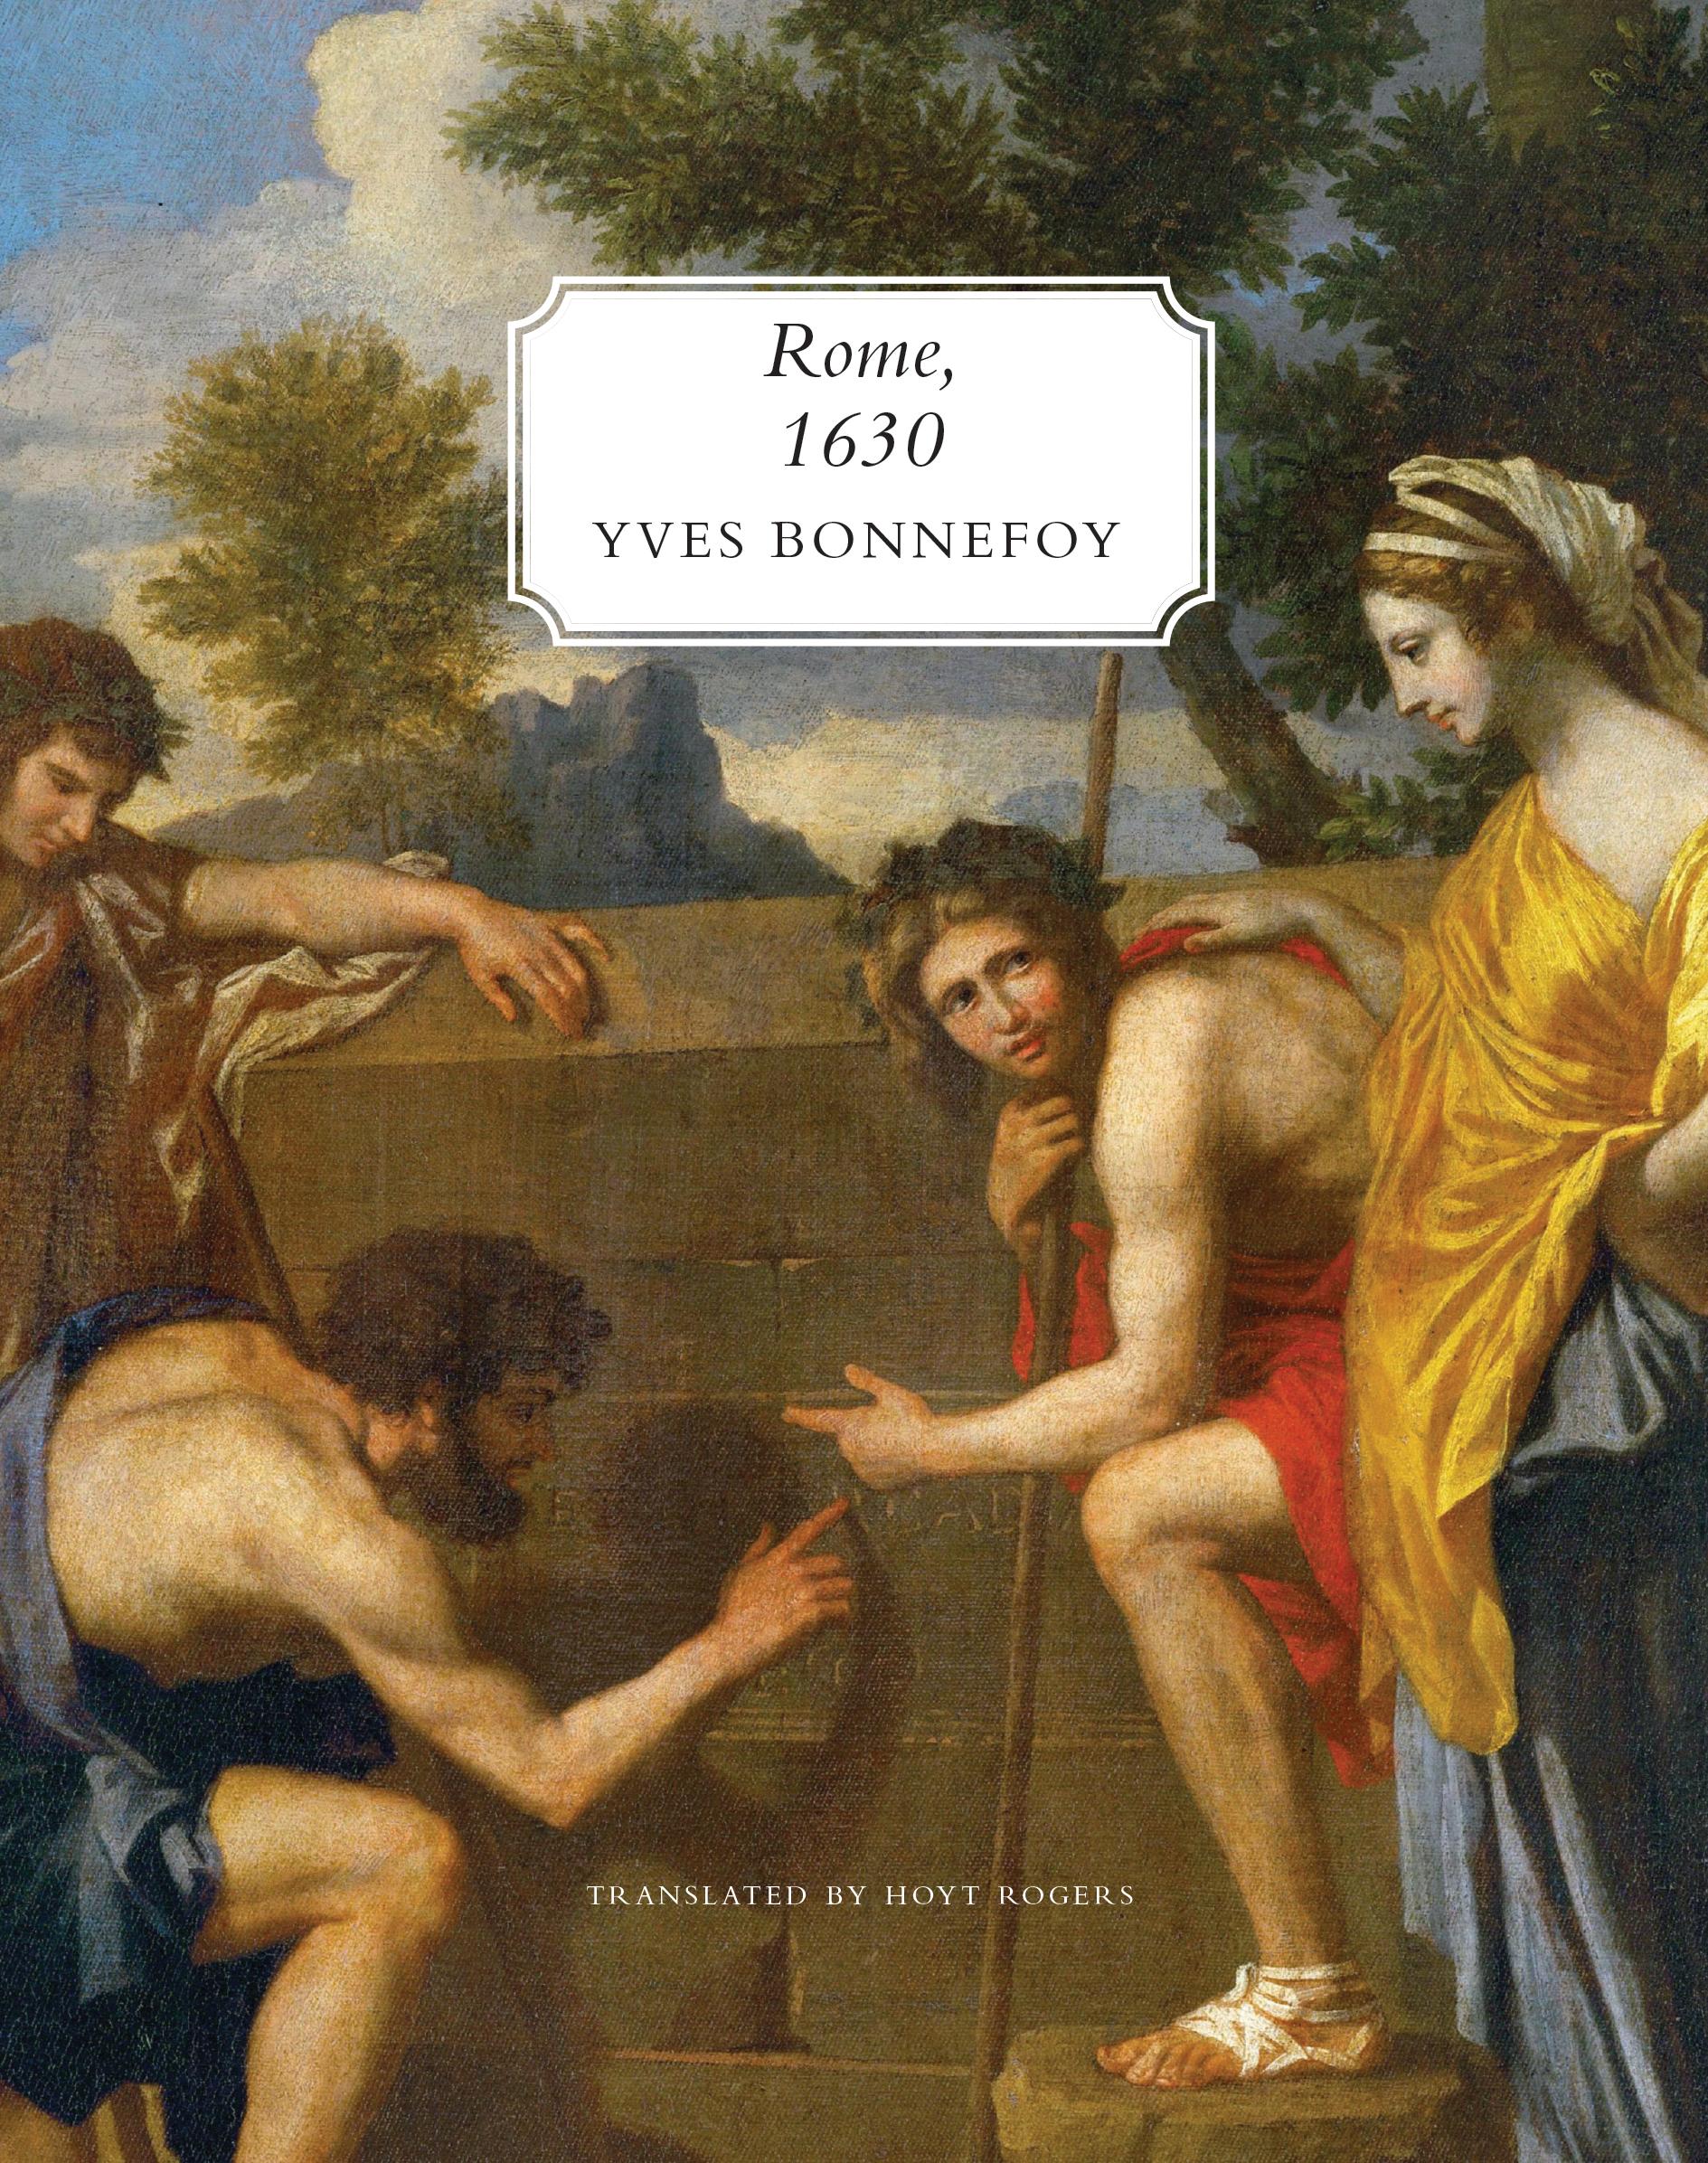 Rome, 1630 by Yves Bonnefoy | Seagull Books